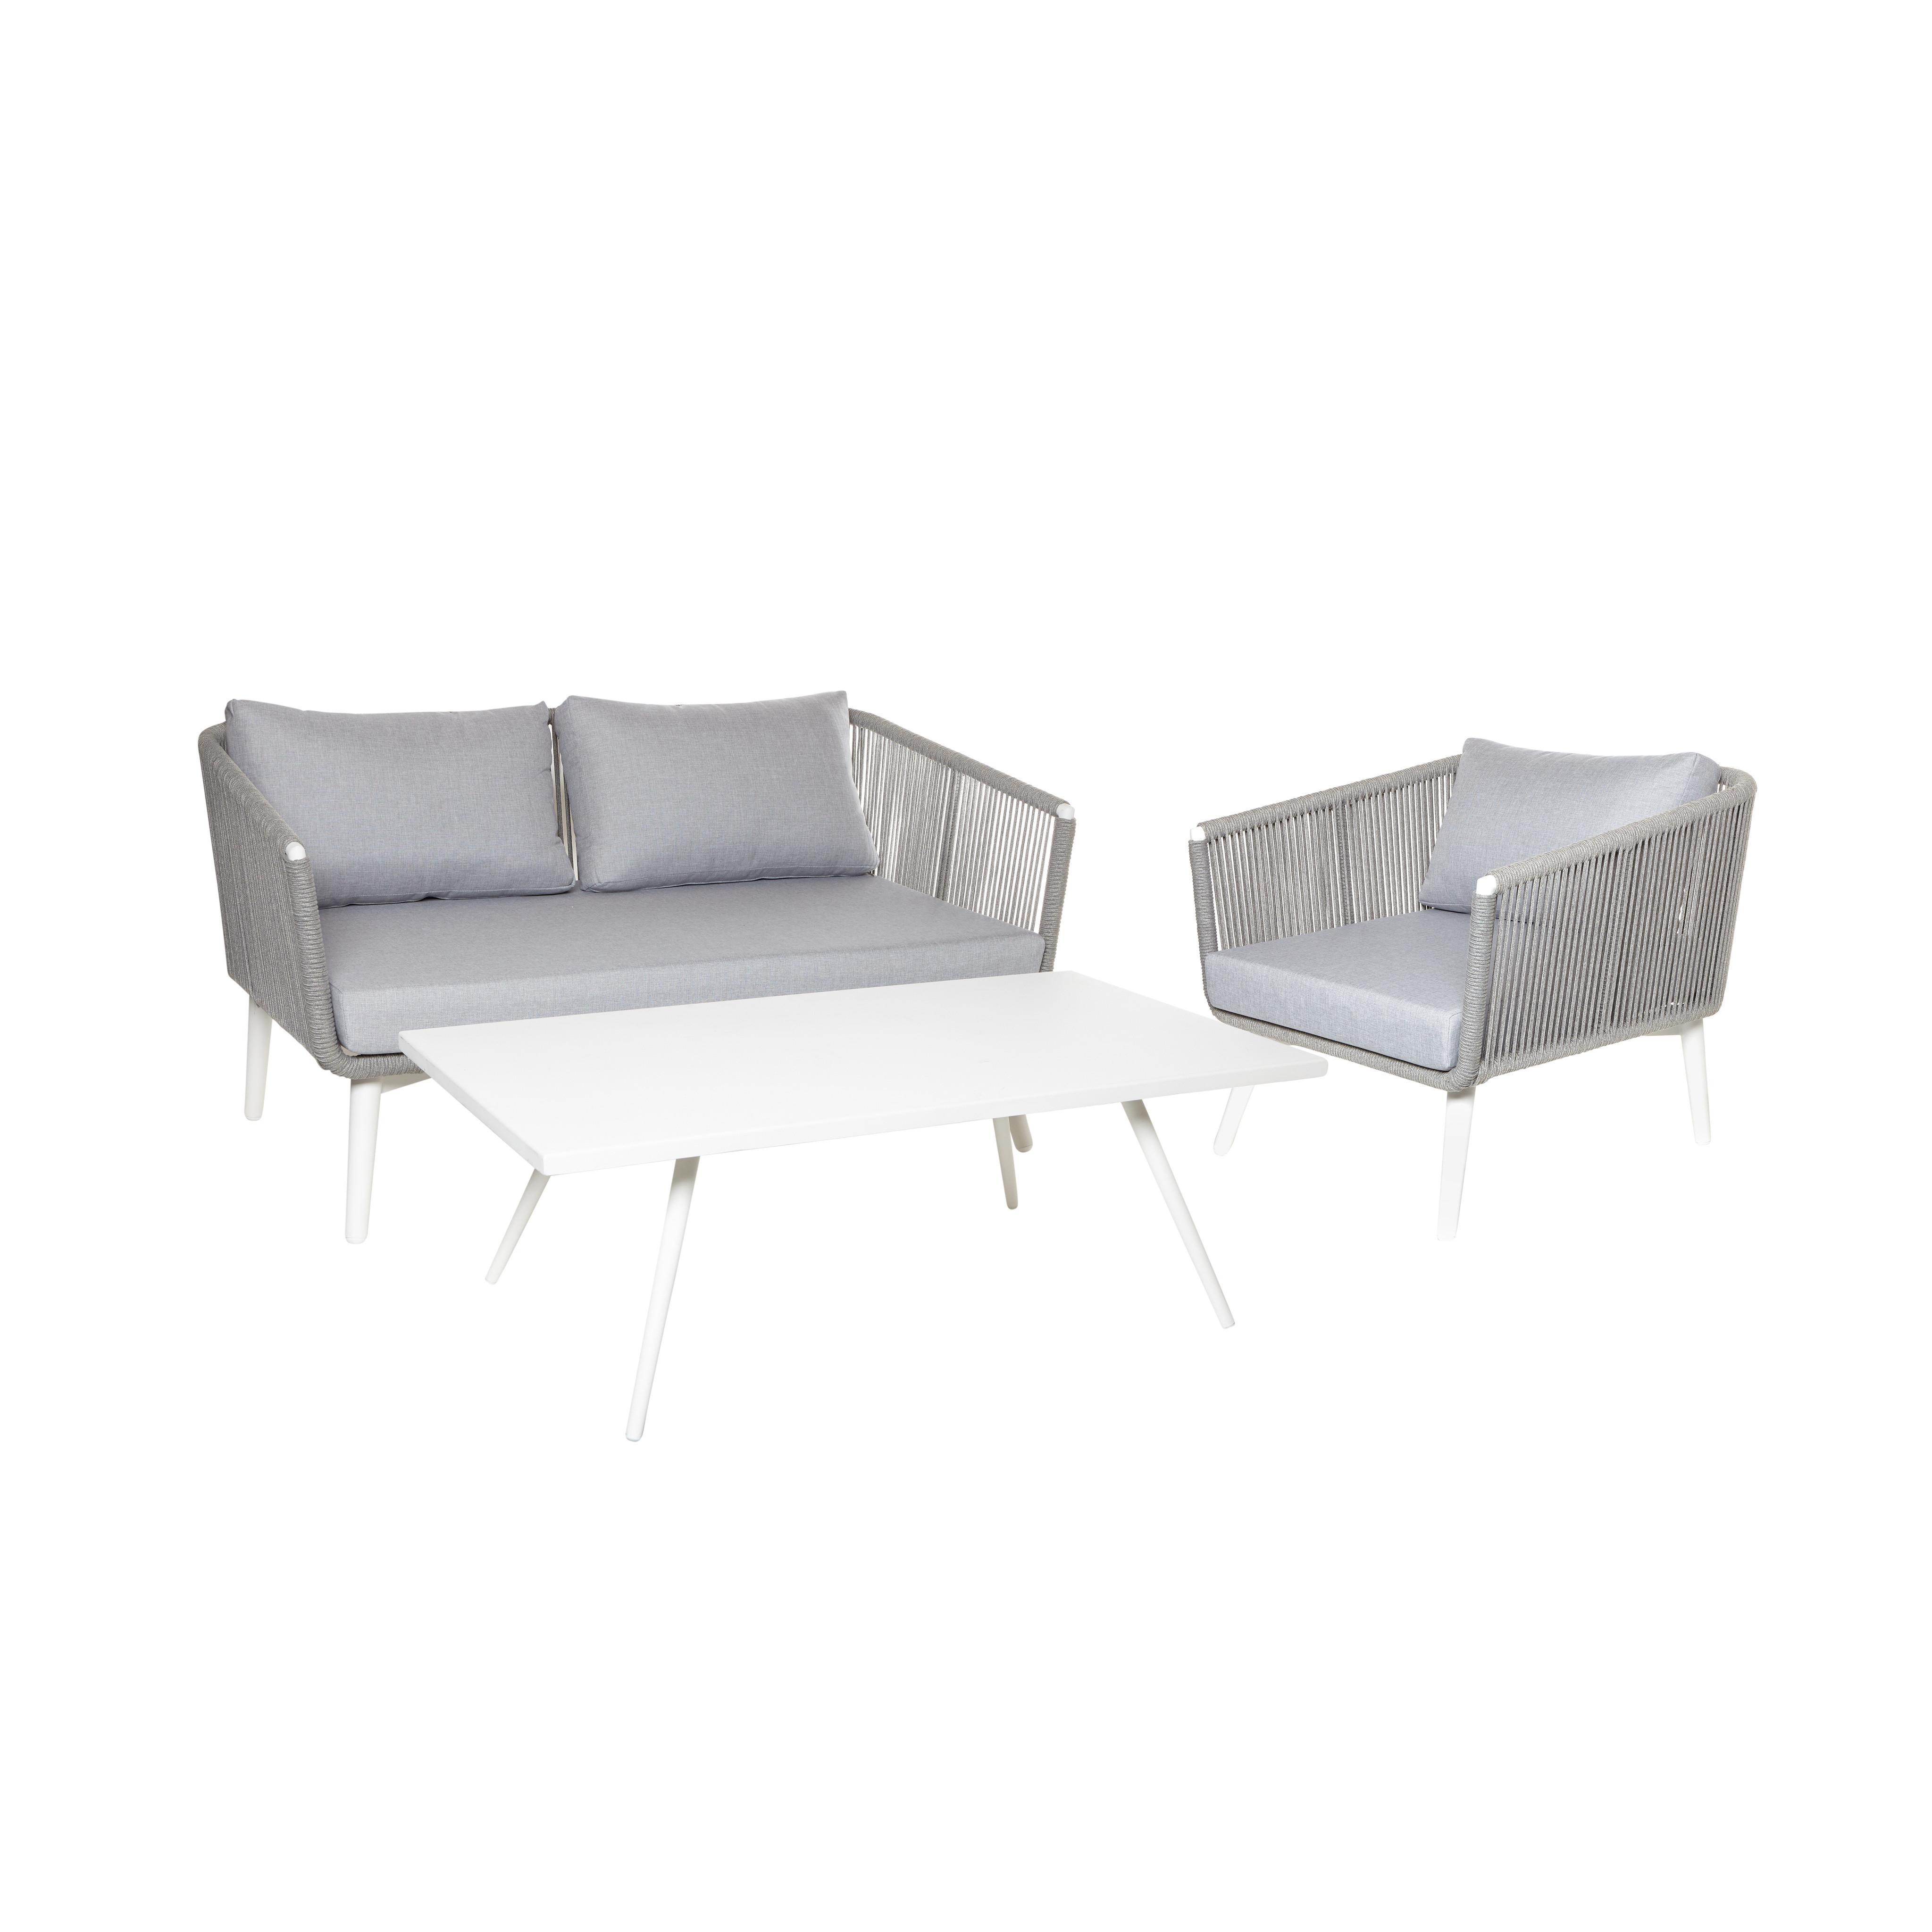 Tavolino alluminio verniciato Cancun, Bianco, large image number 2